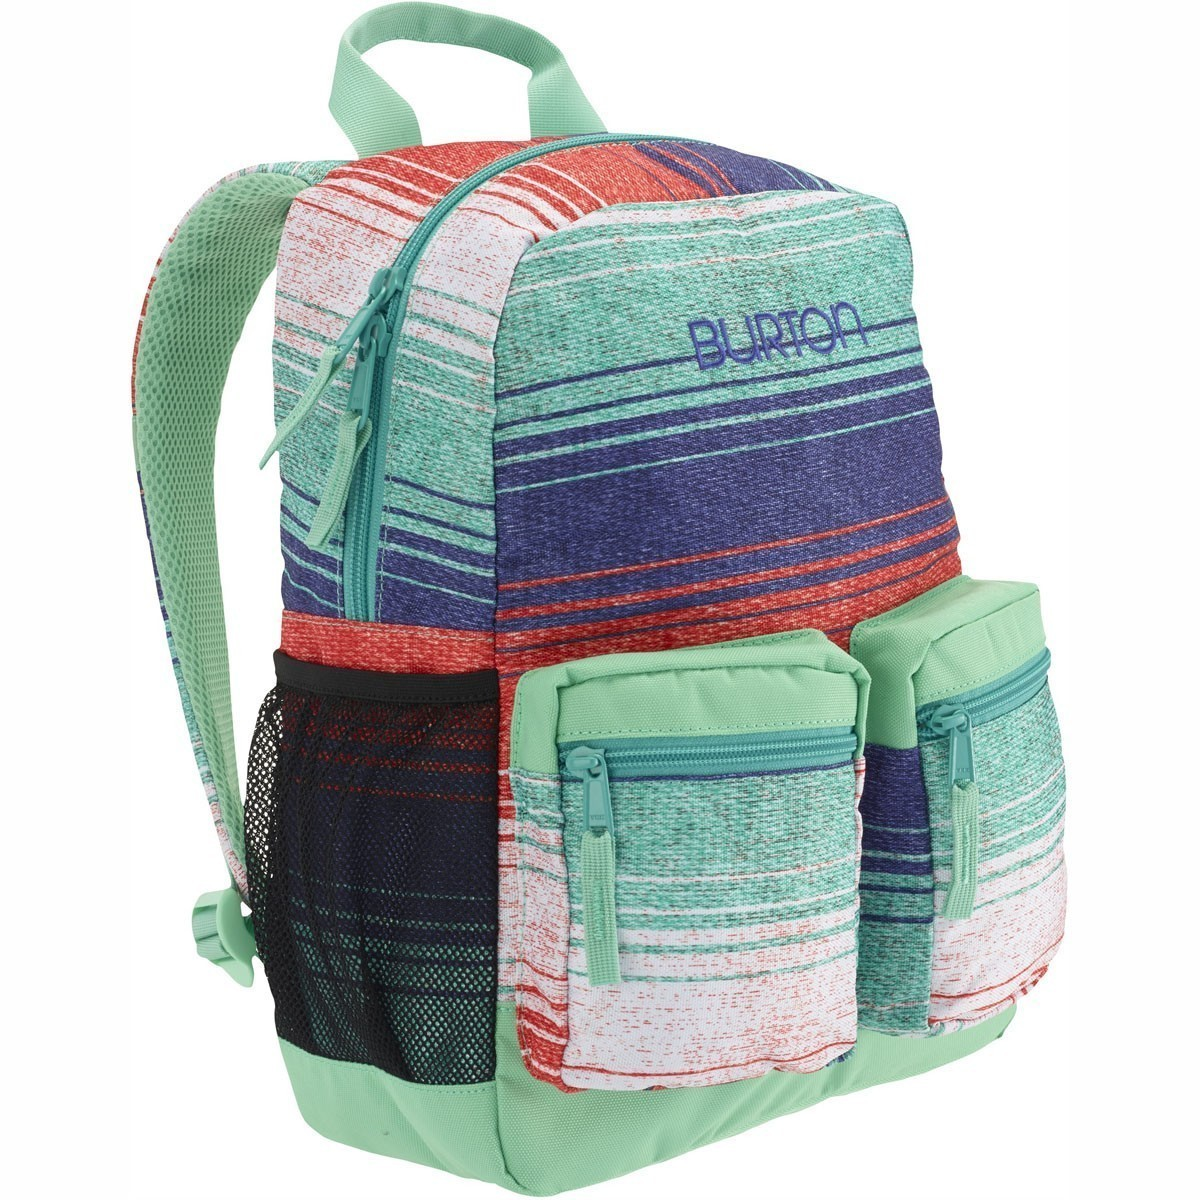 Рюкзак burton yth gromlet pack fw15 рюкзак охотник 60 литров